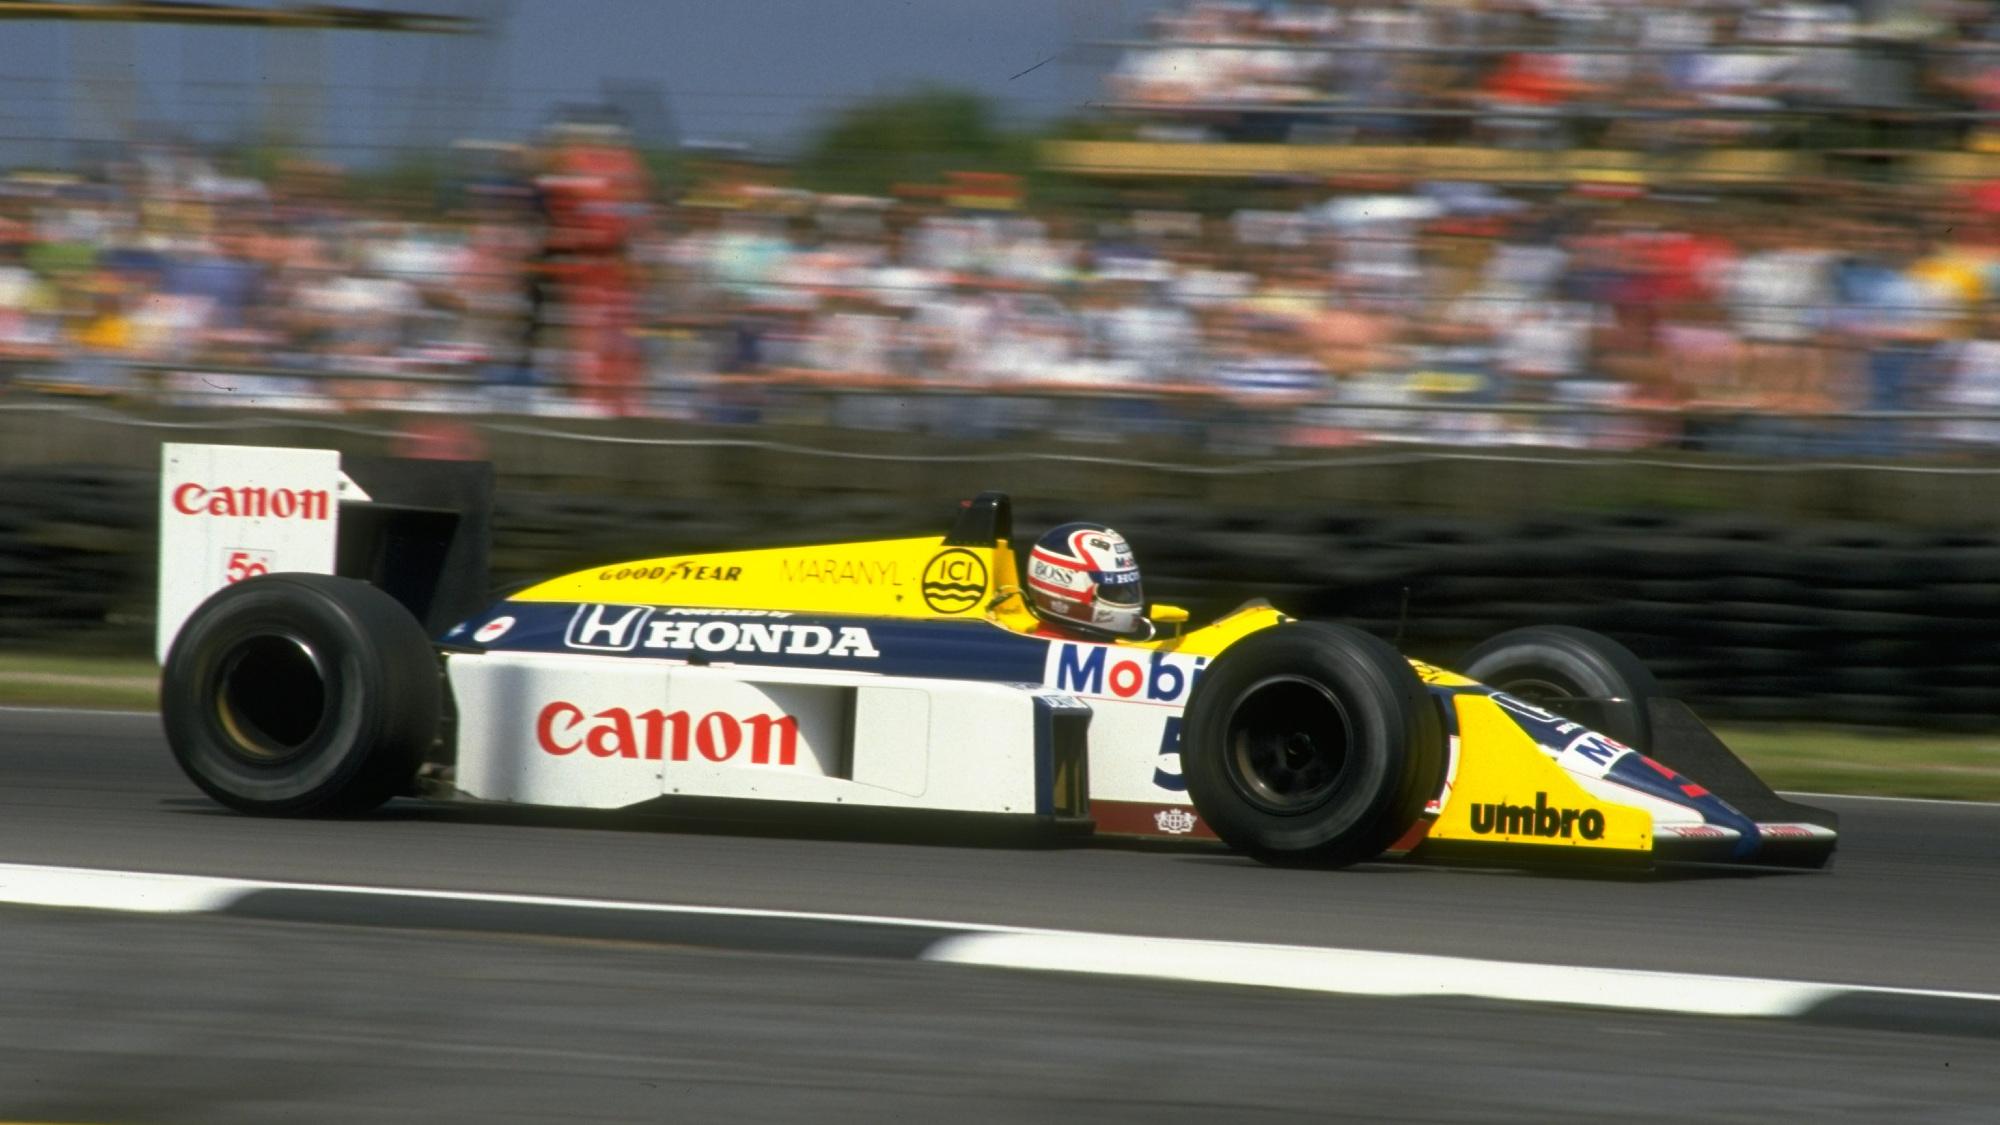 Nigel Mansell, 1987 British GP